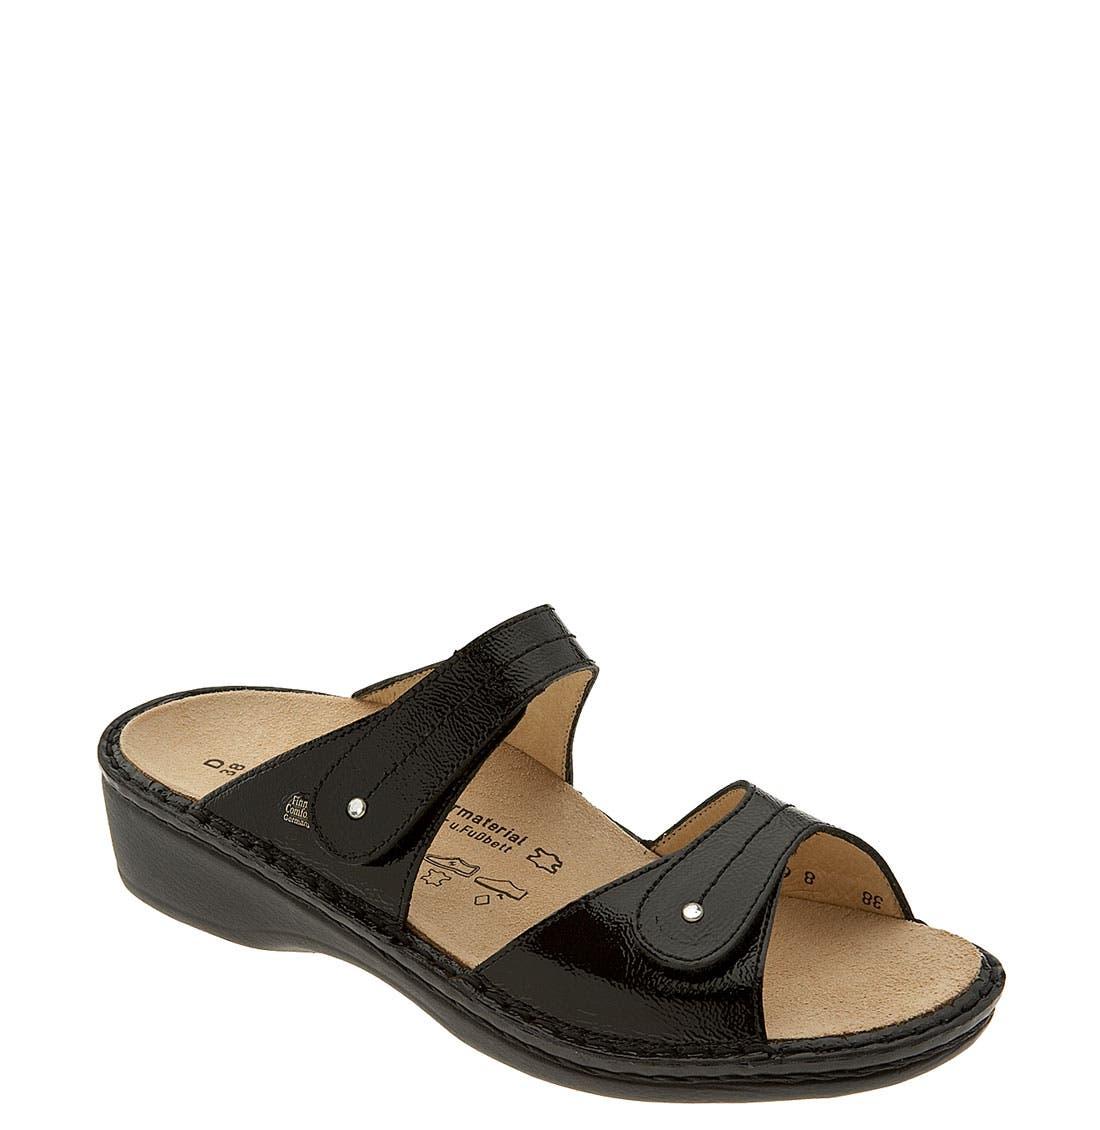 Main Image - Finn Comfort 'Catalina' Sandal (Online Only)